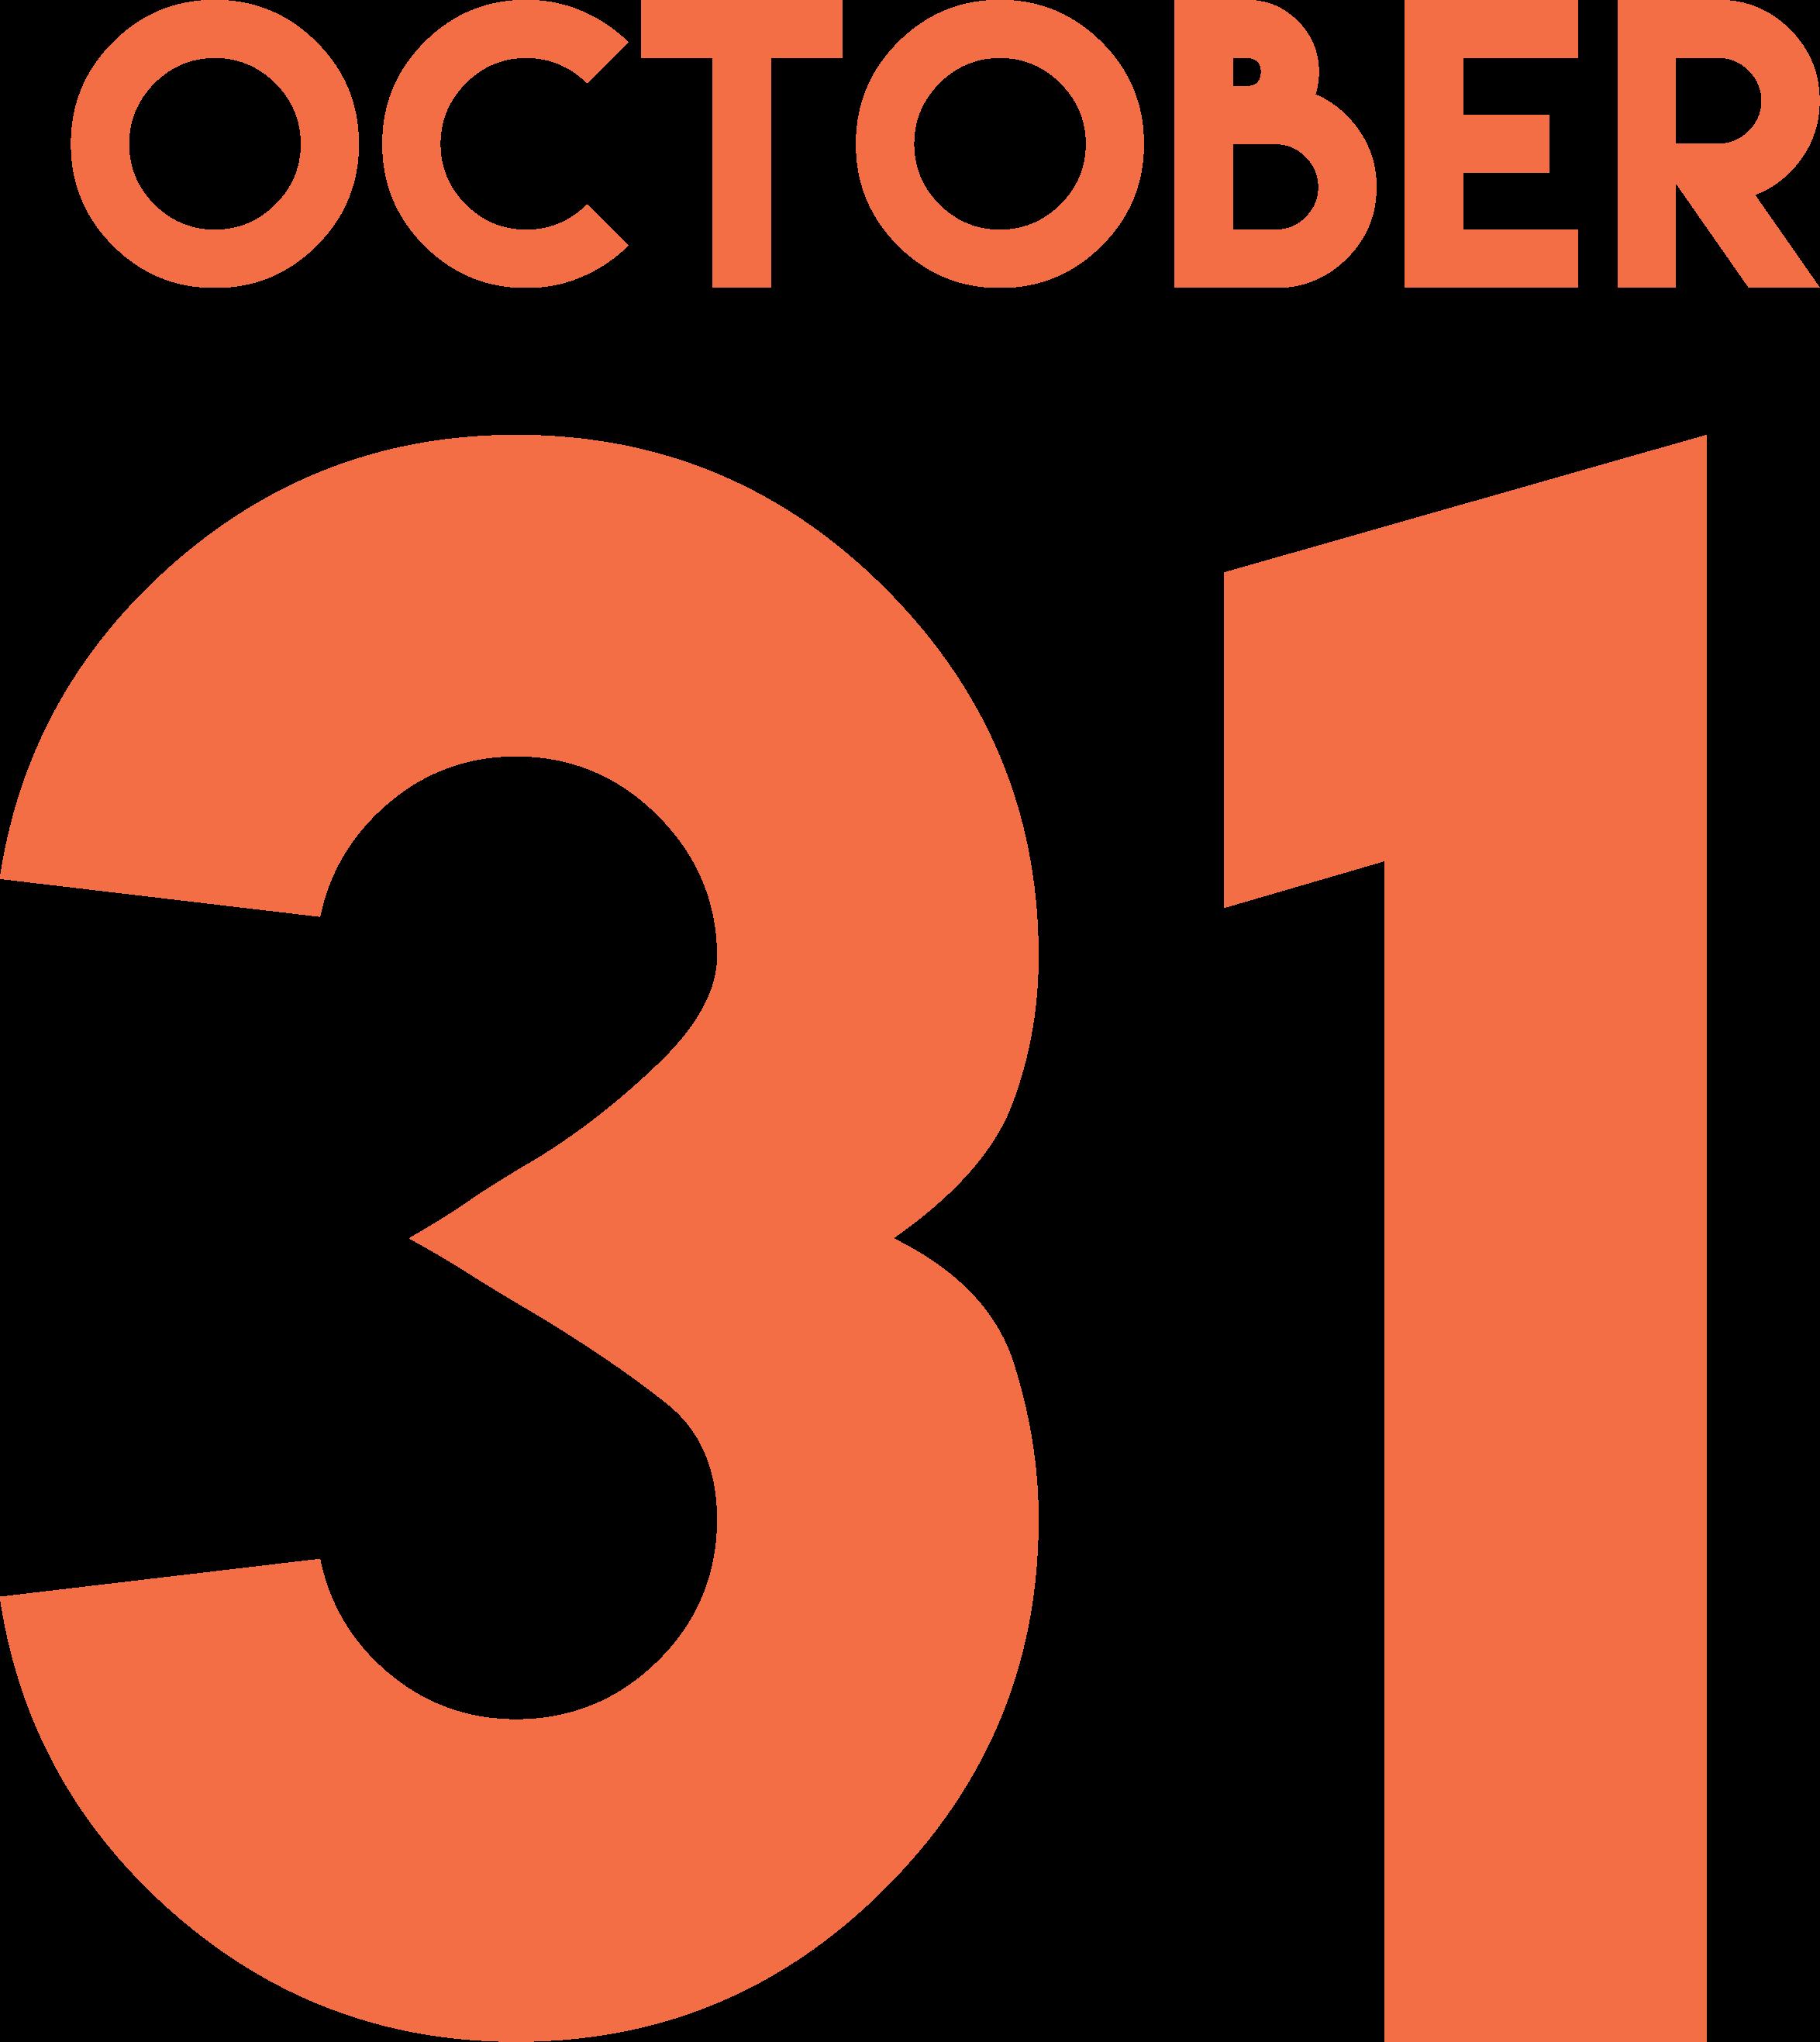 Happy Halloween October 31 SVG Cut File